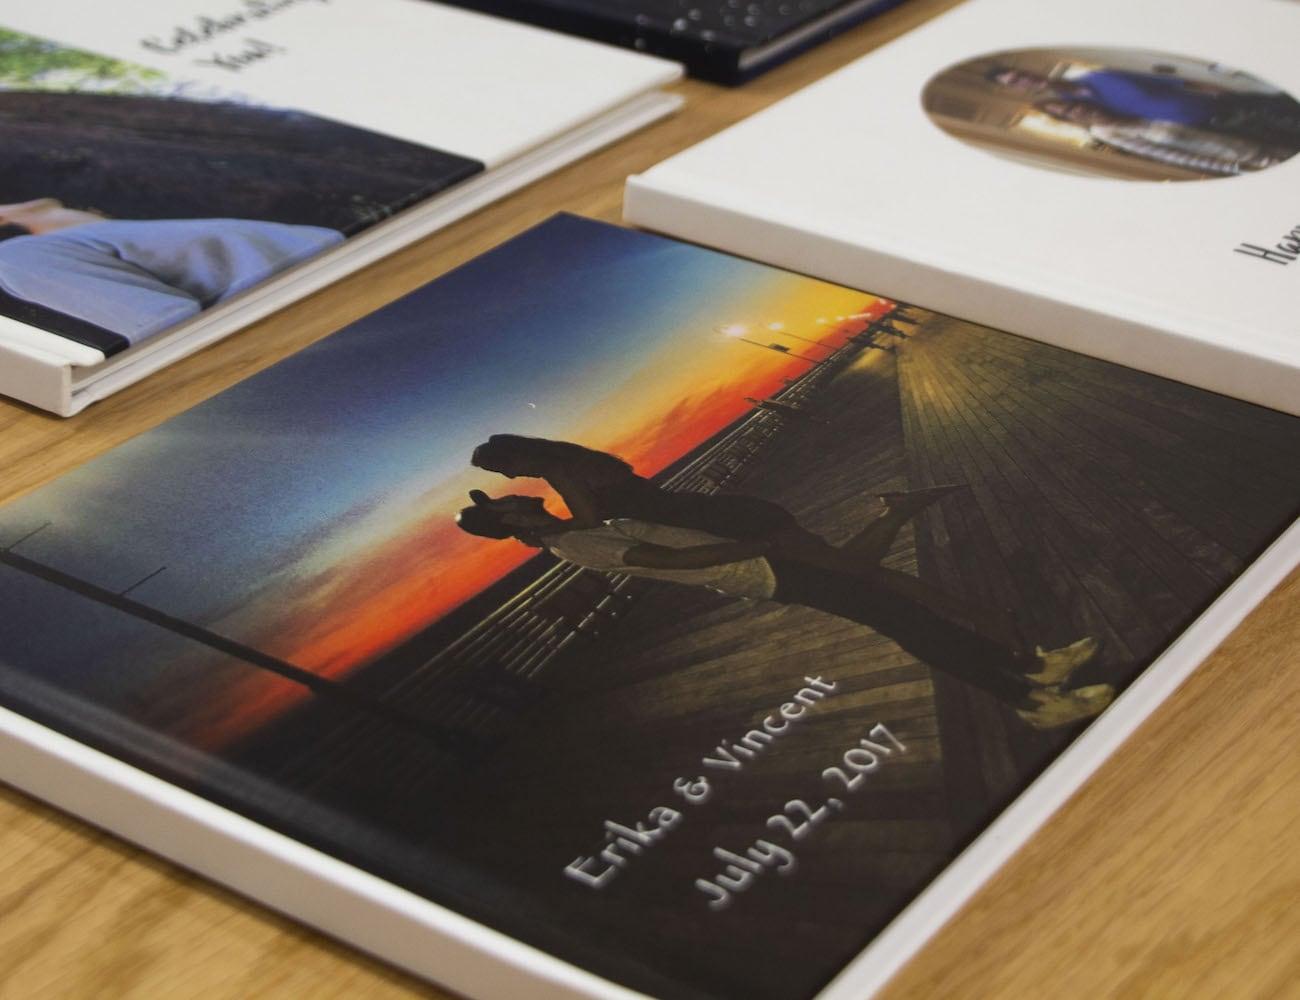 Kindra Custom Photo Legacy Book lets you craft a beautiful memory